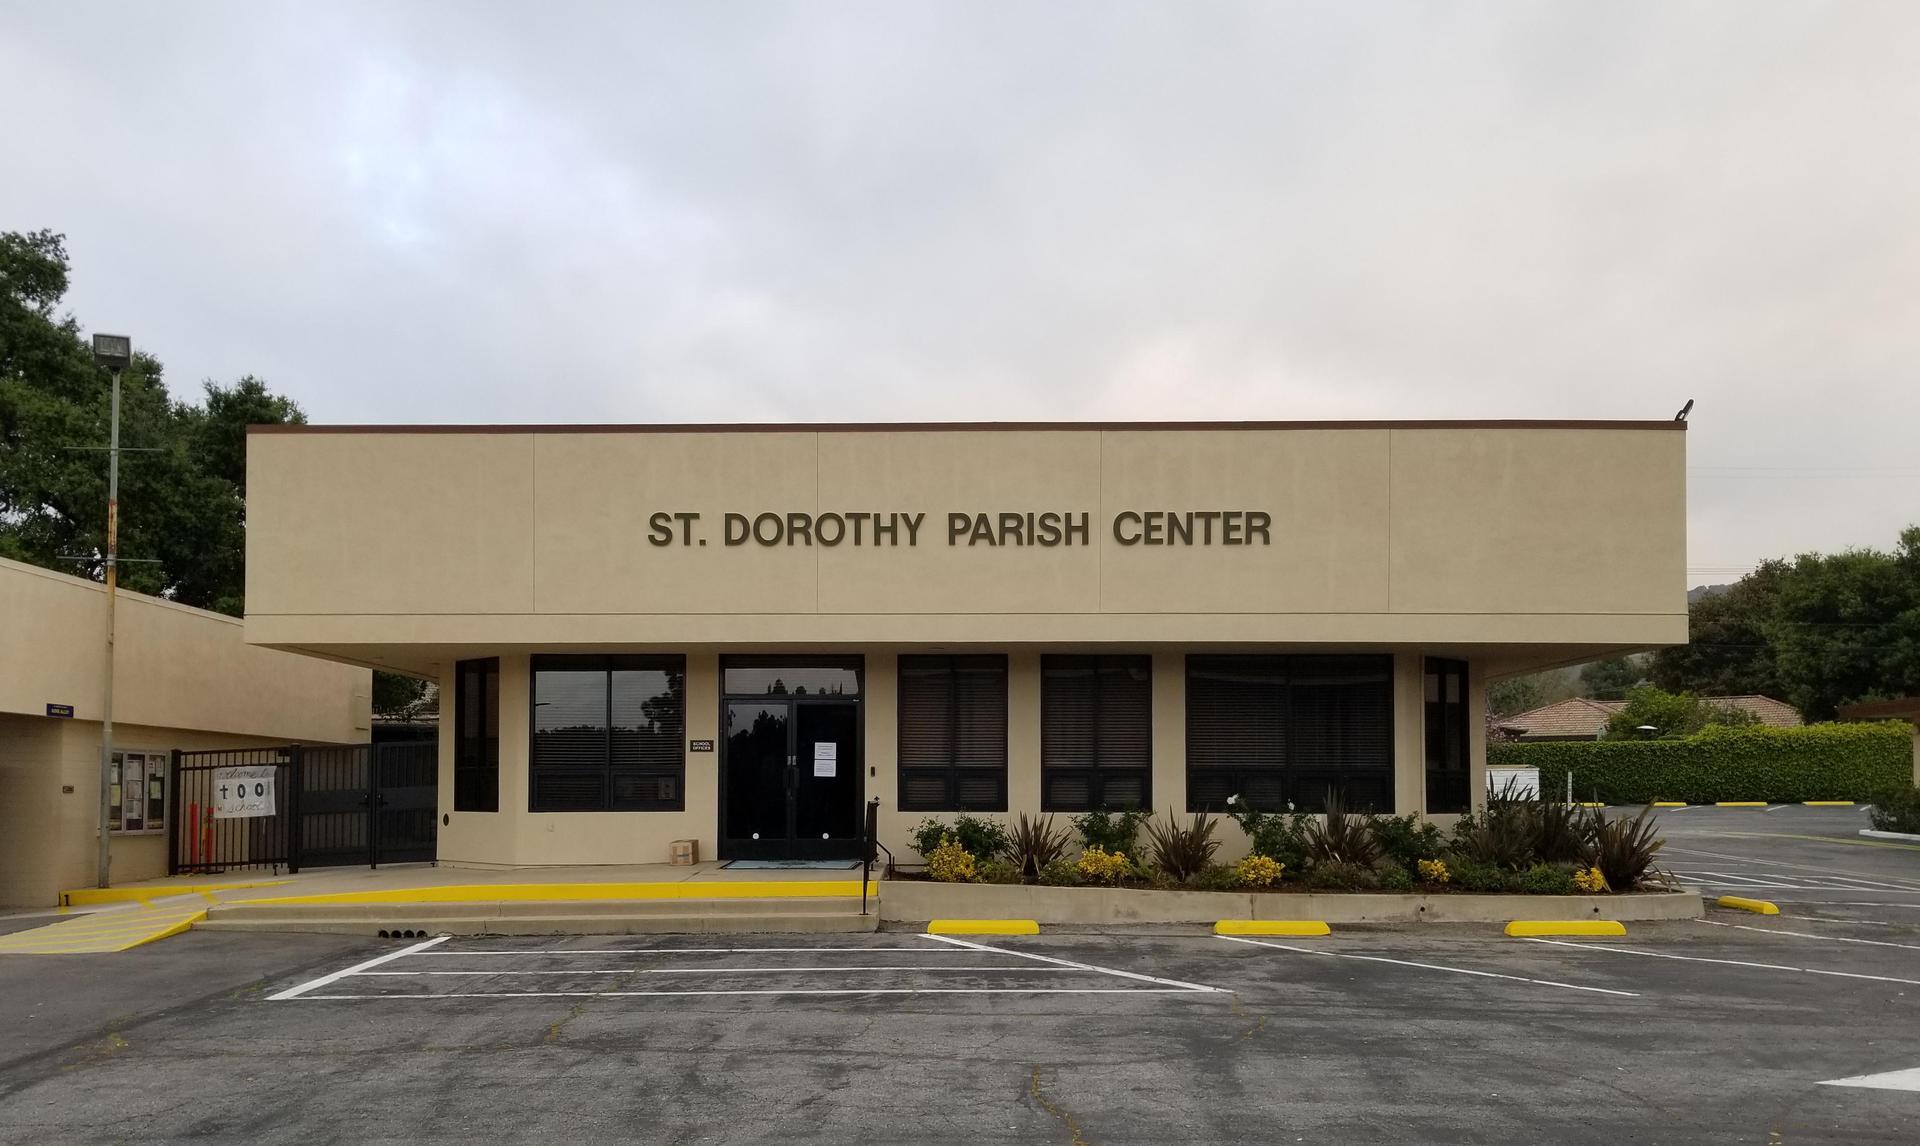 St. Dorothy Parish Center